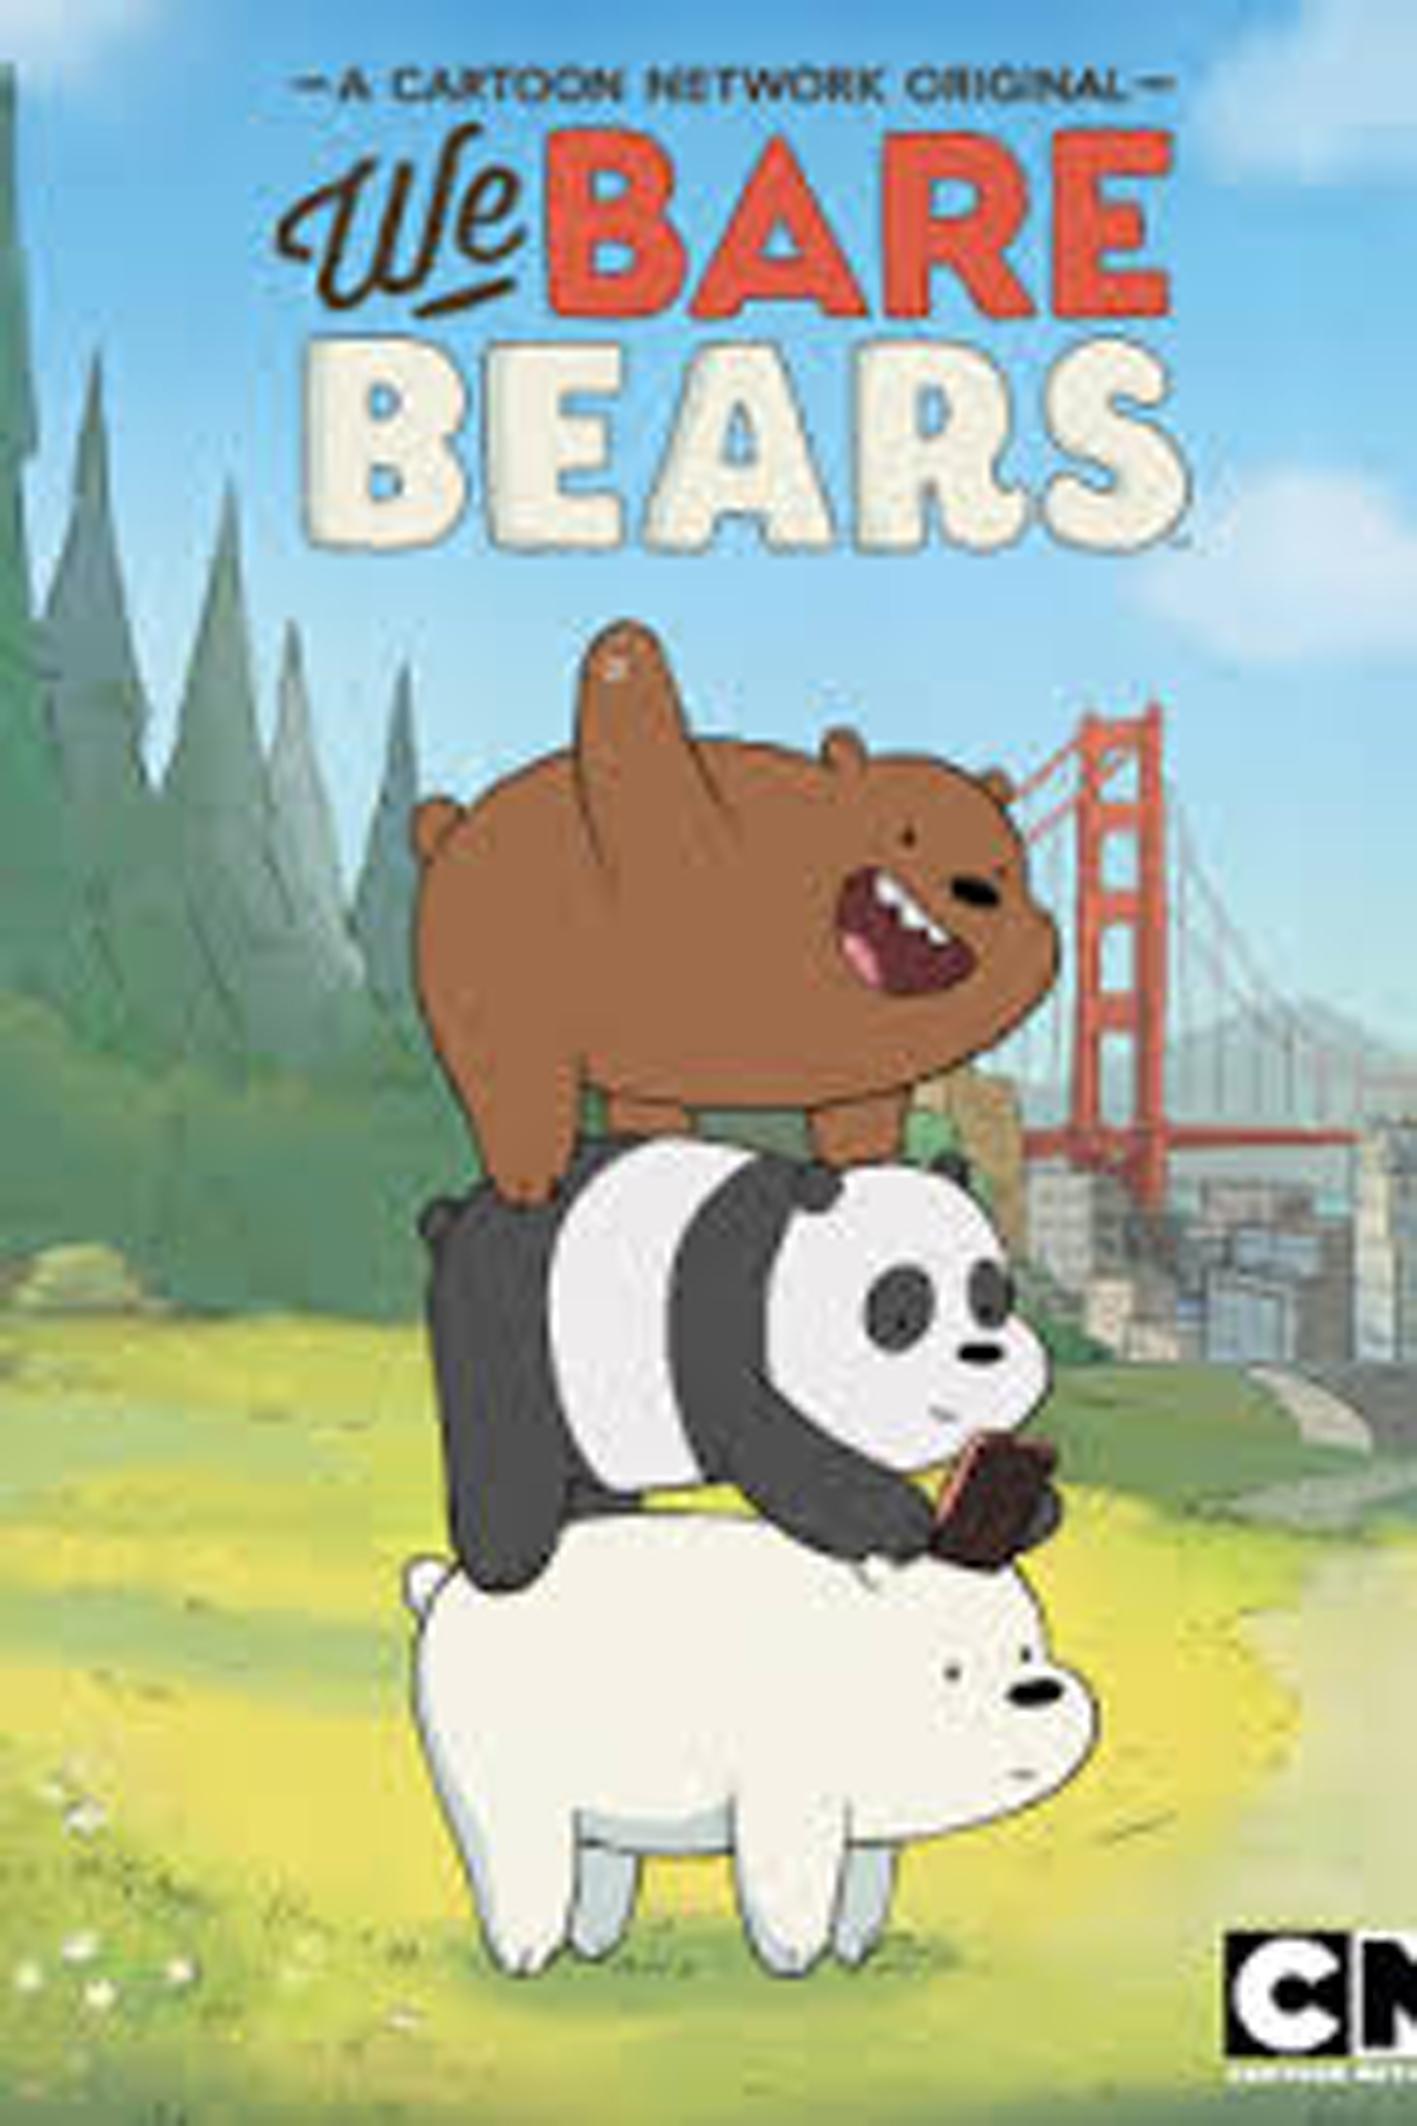 We Bare Bears S2 - 熊熊遇見你2